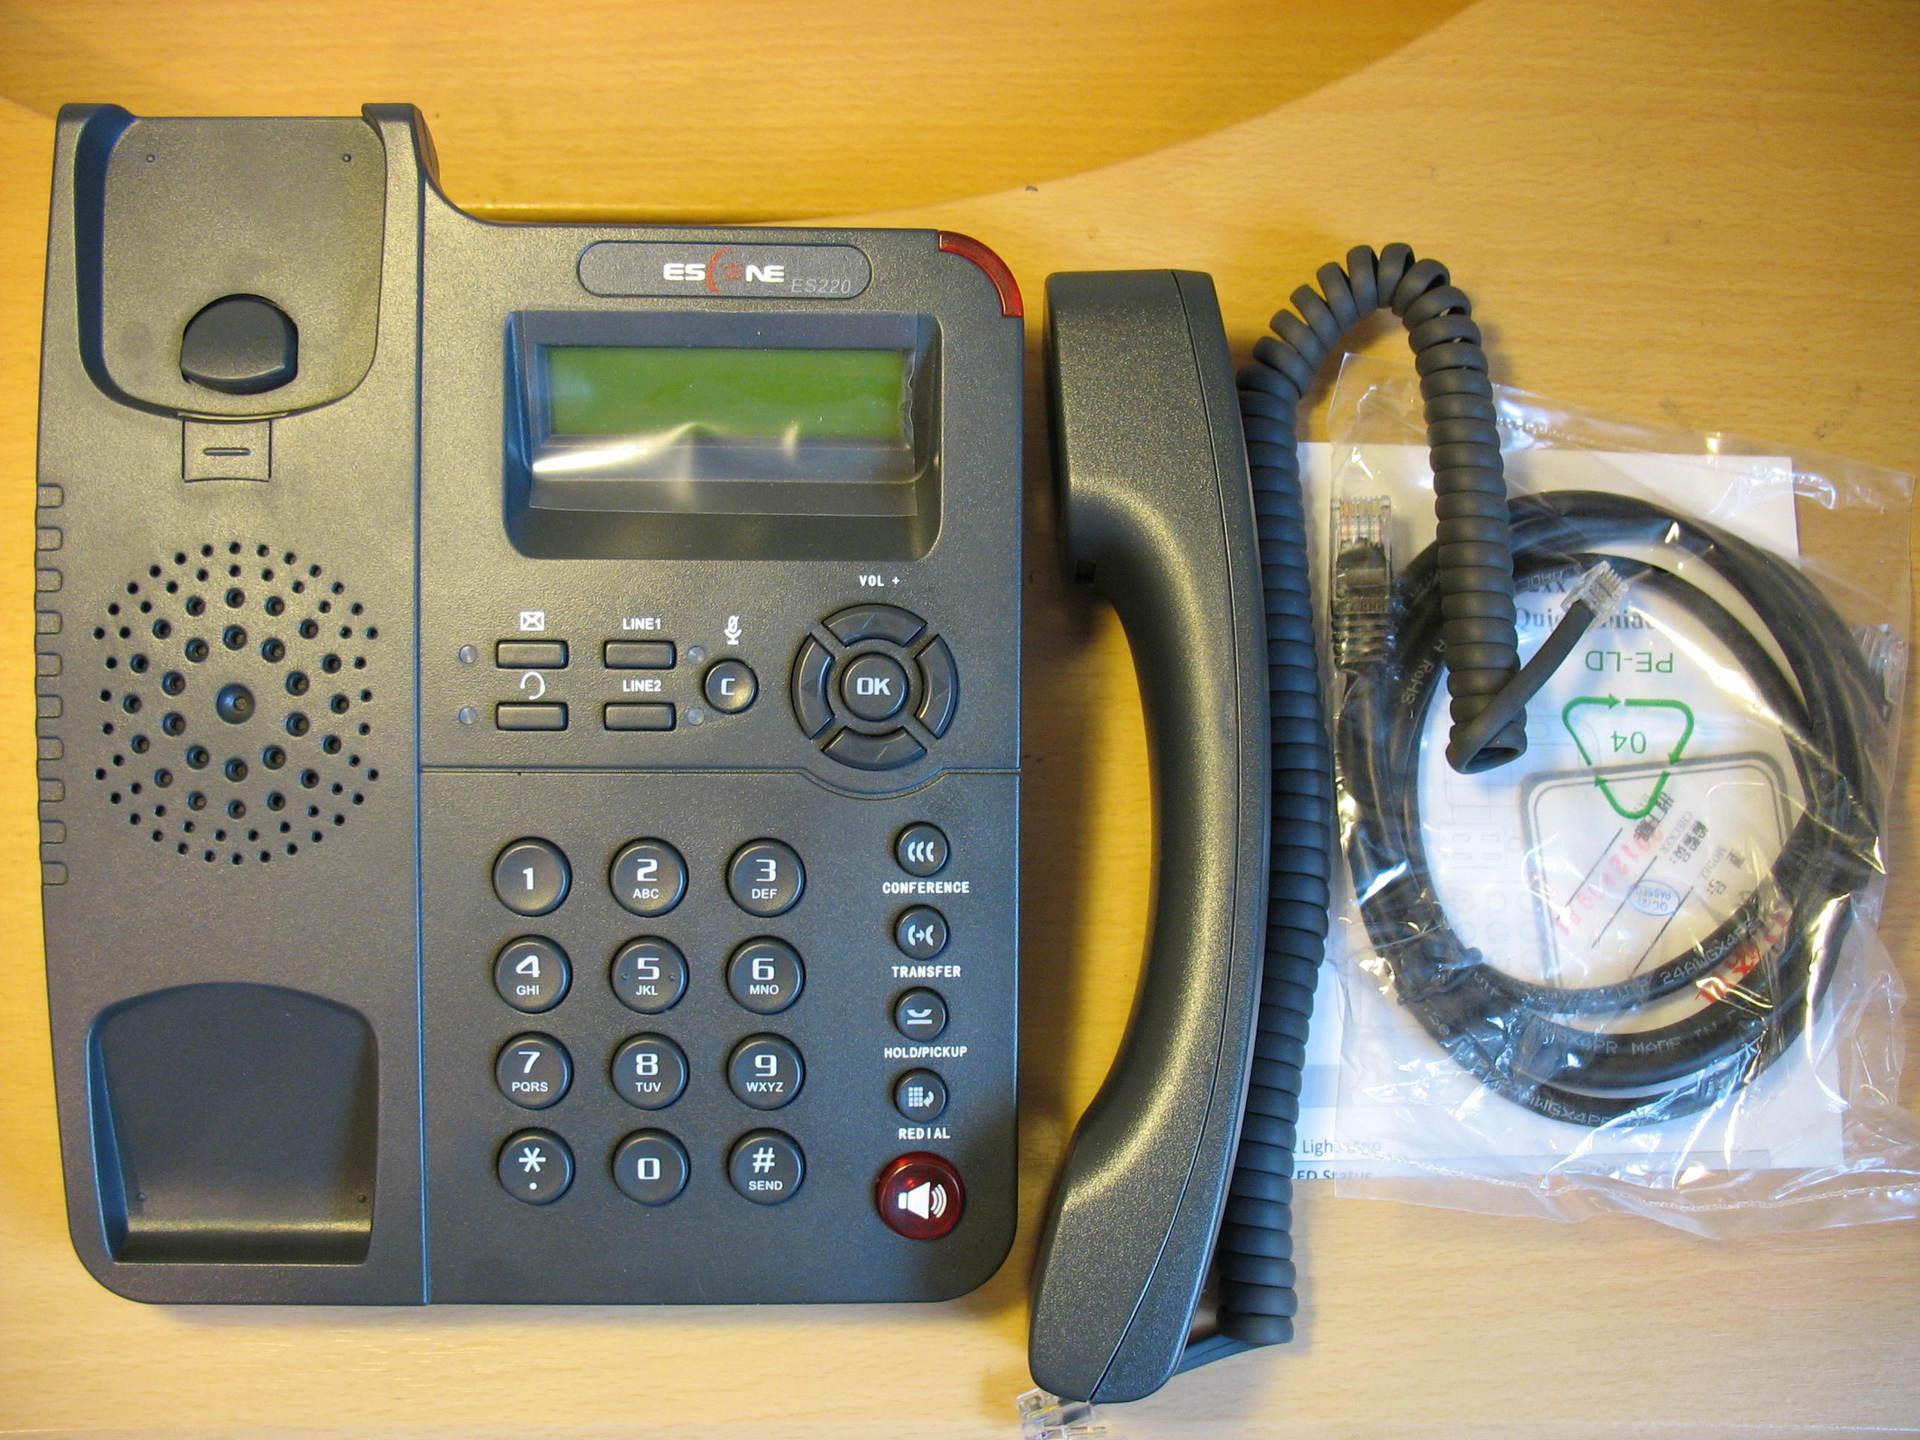 Комплект поставки телефона Escene ES220